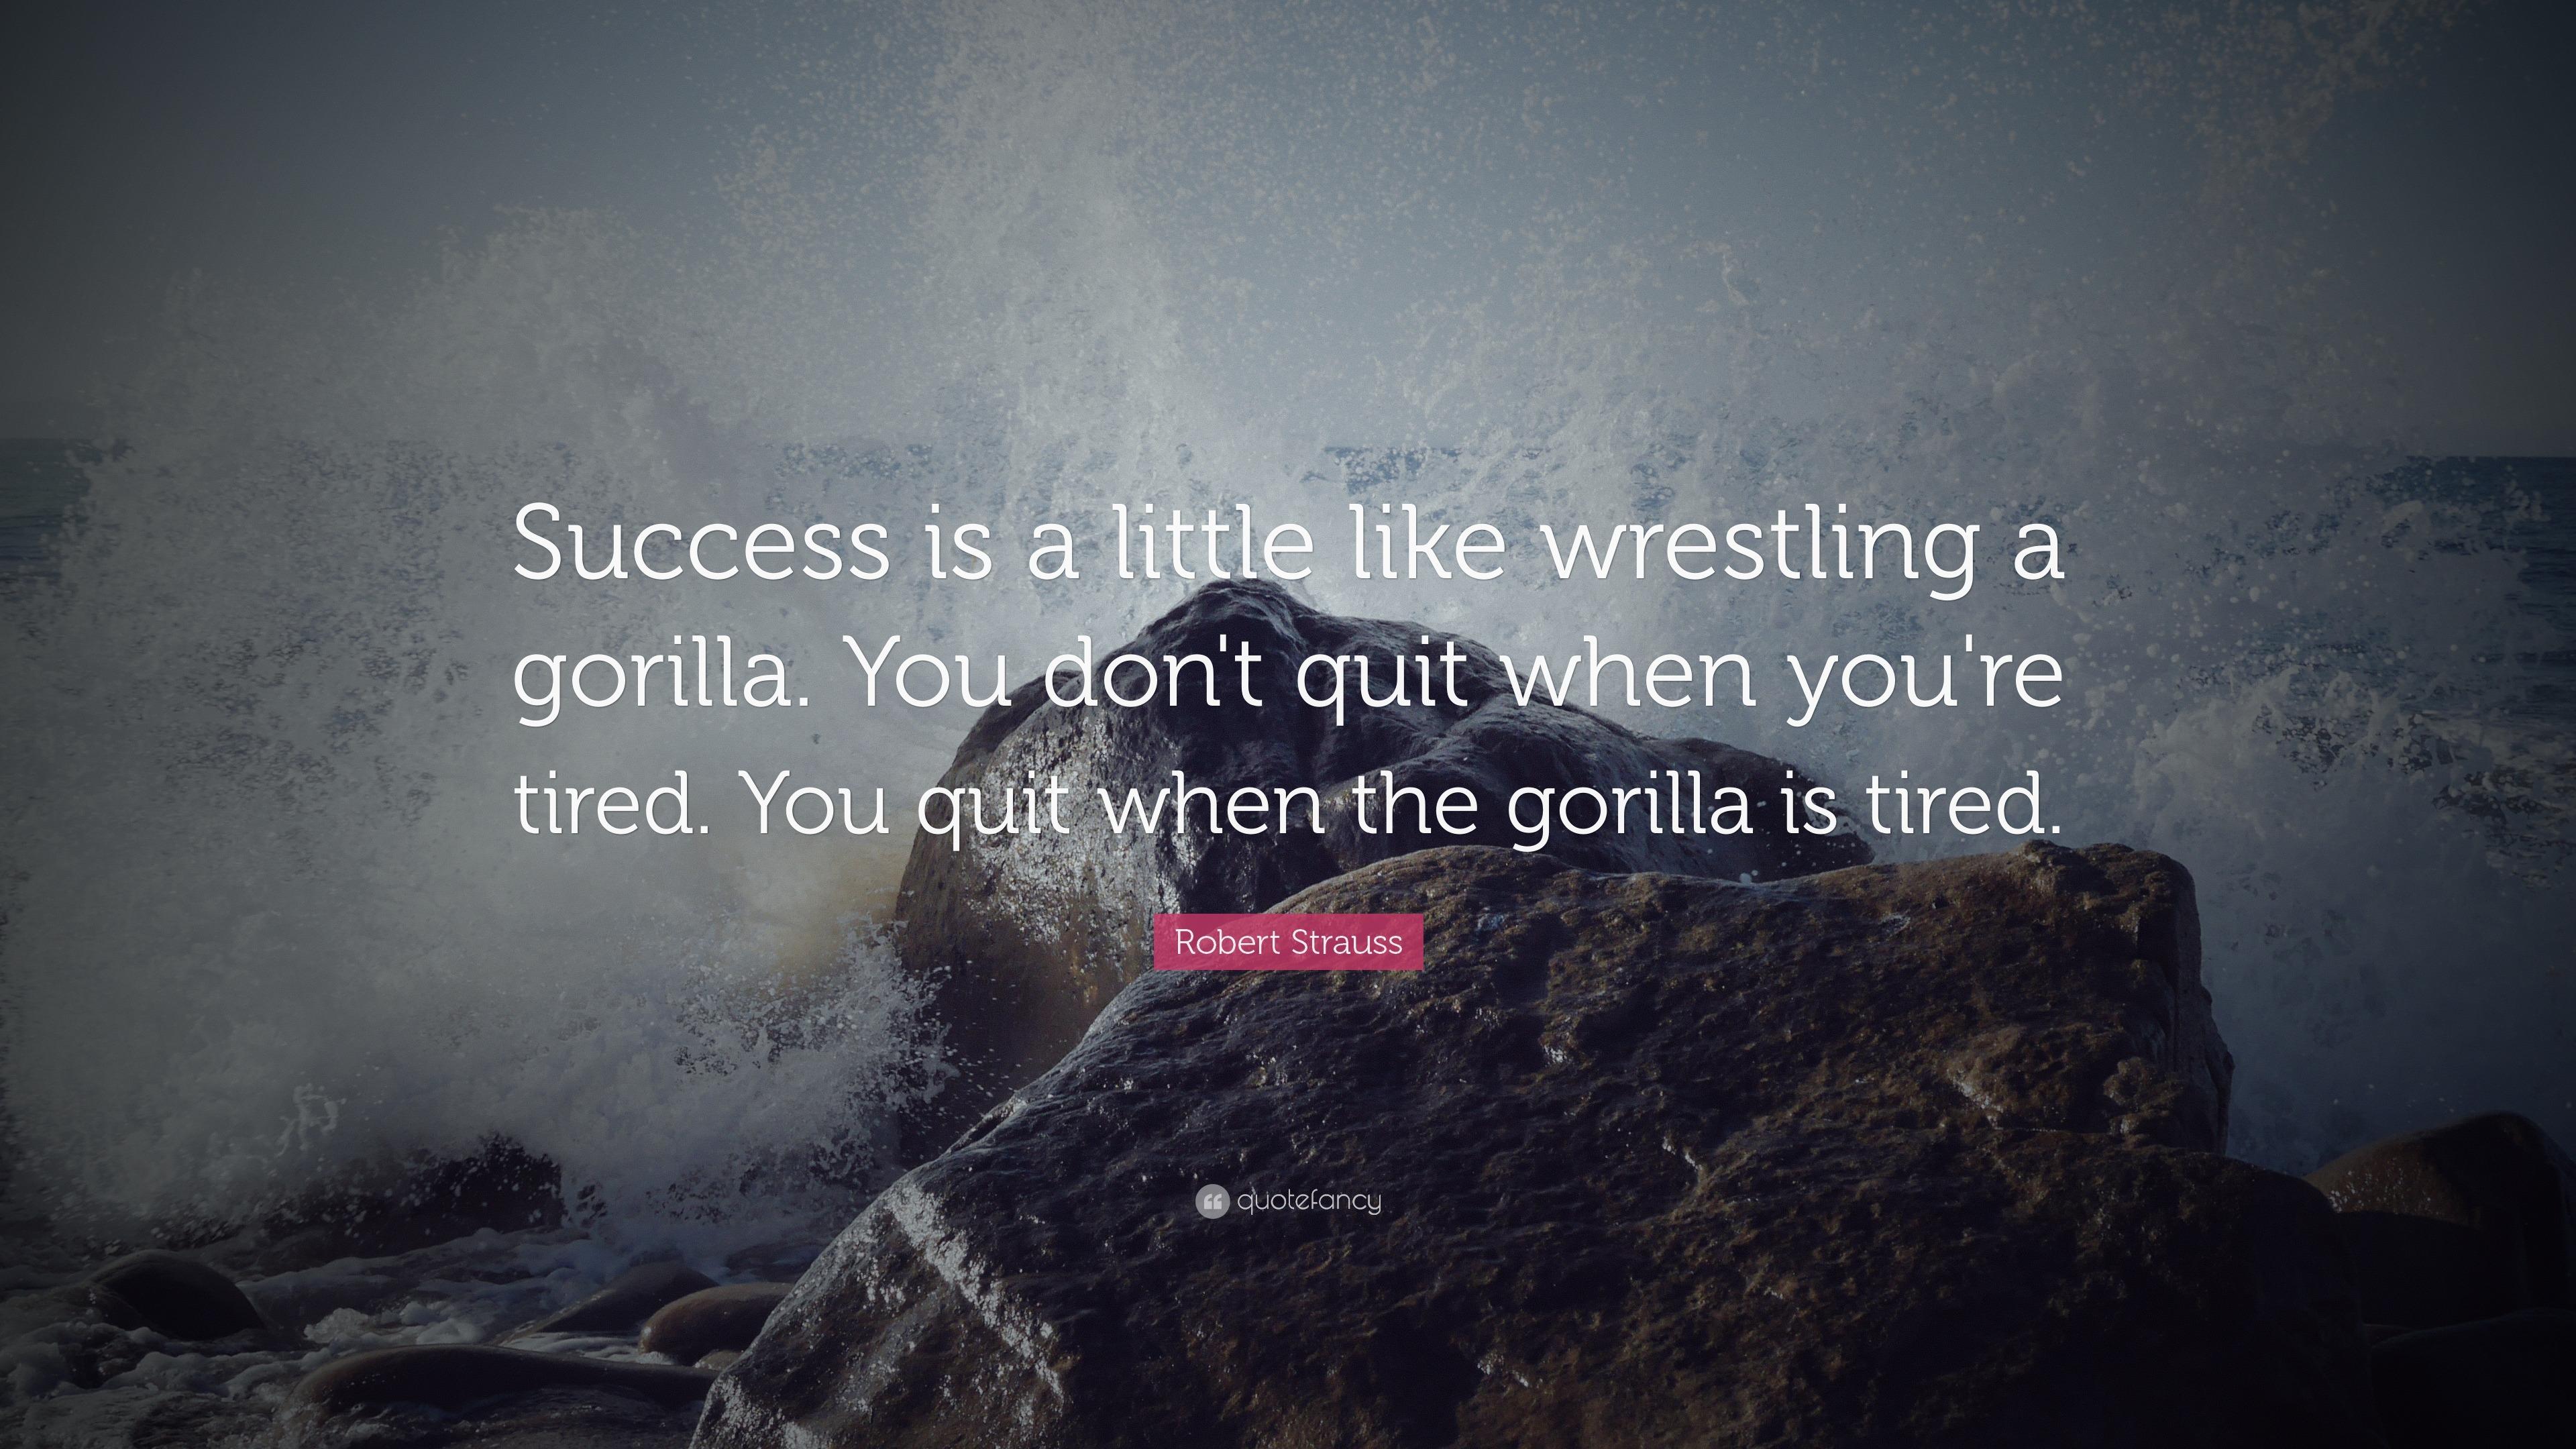 Success quotes 52 wallpapers quotefancy - Quit wallpaper ...